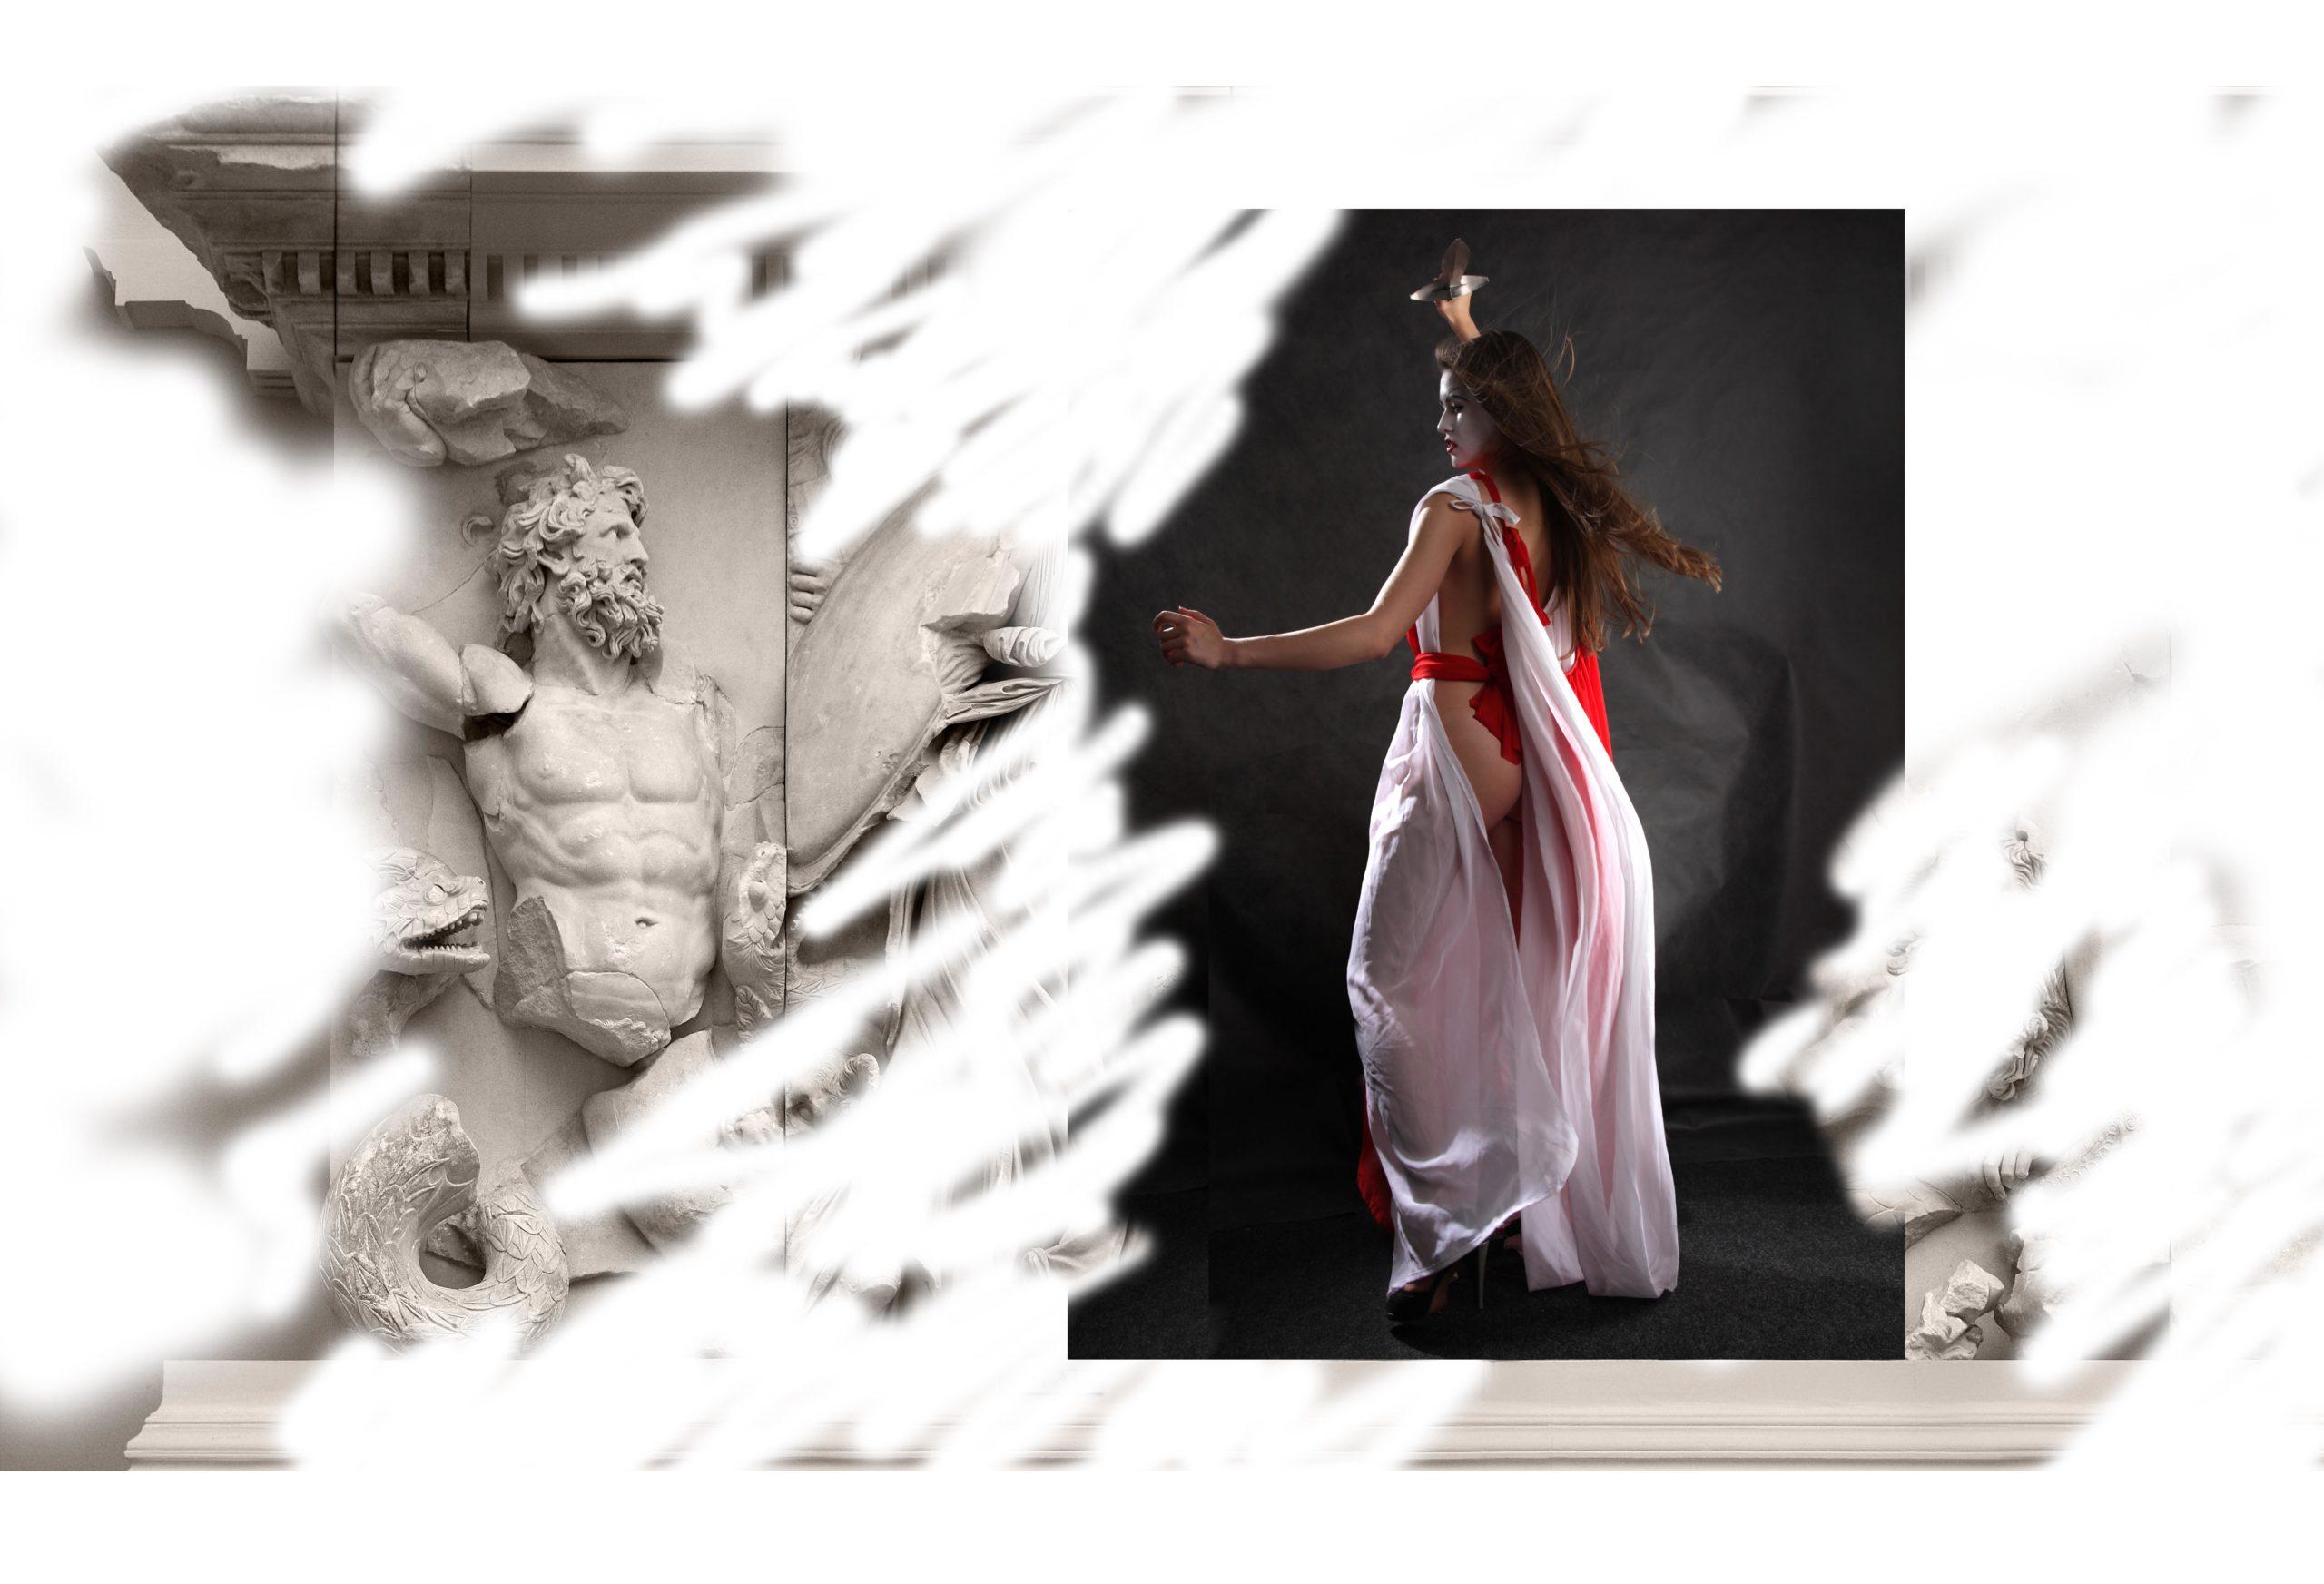 Frauenpower! Kämpfende Göttinnen im Fries des Pergamonaltars